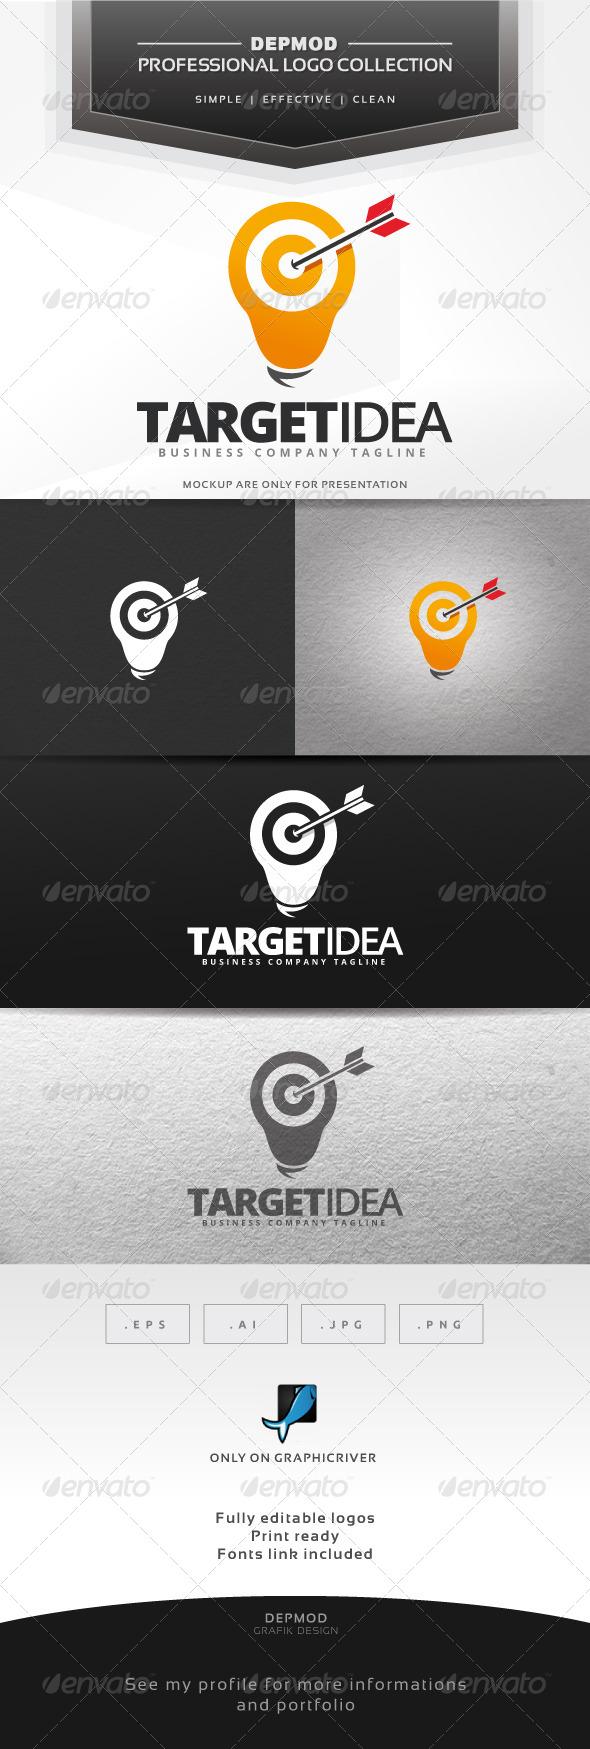 GraphicRiver Target Idea Logo 6871865